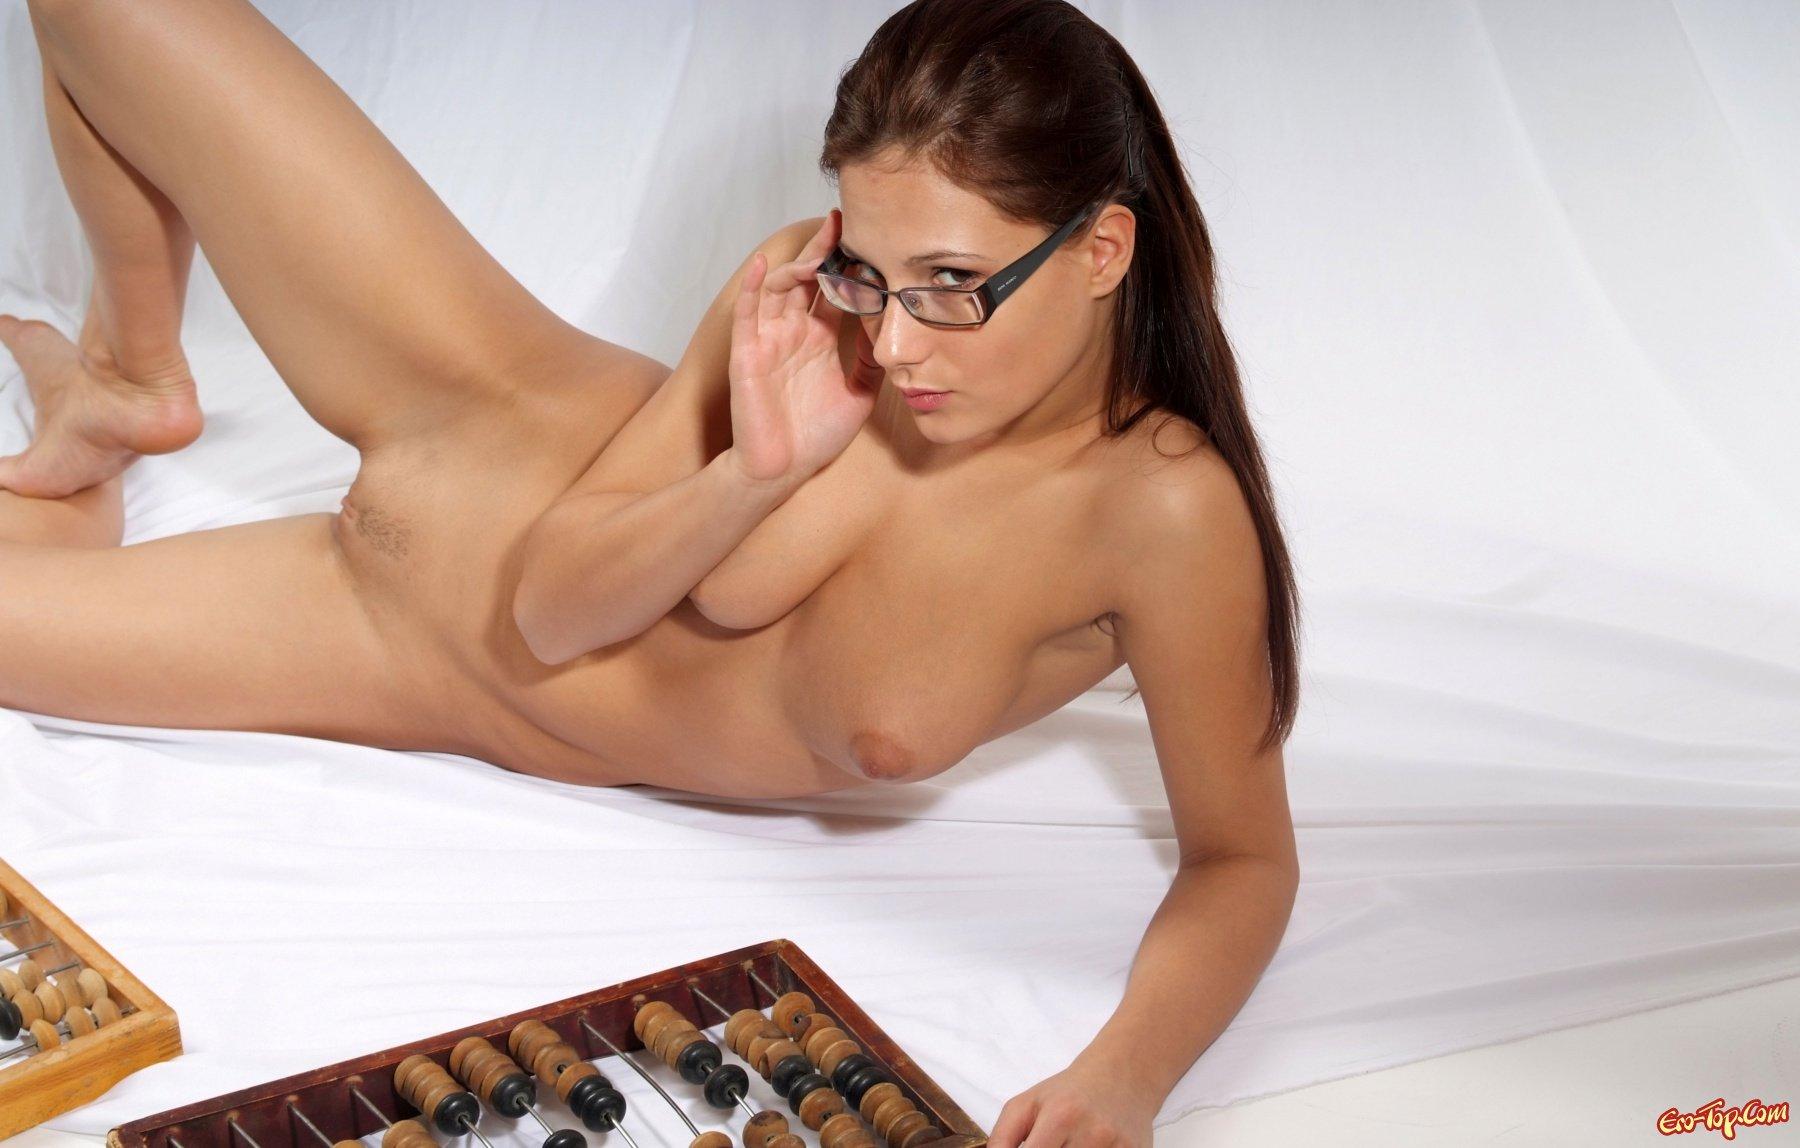 Секс с очках девушки фото 19 фотография